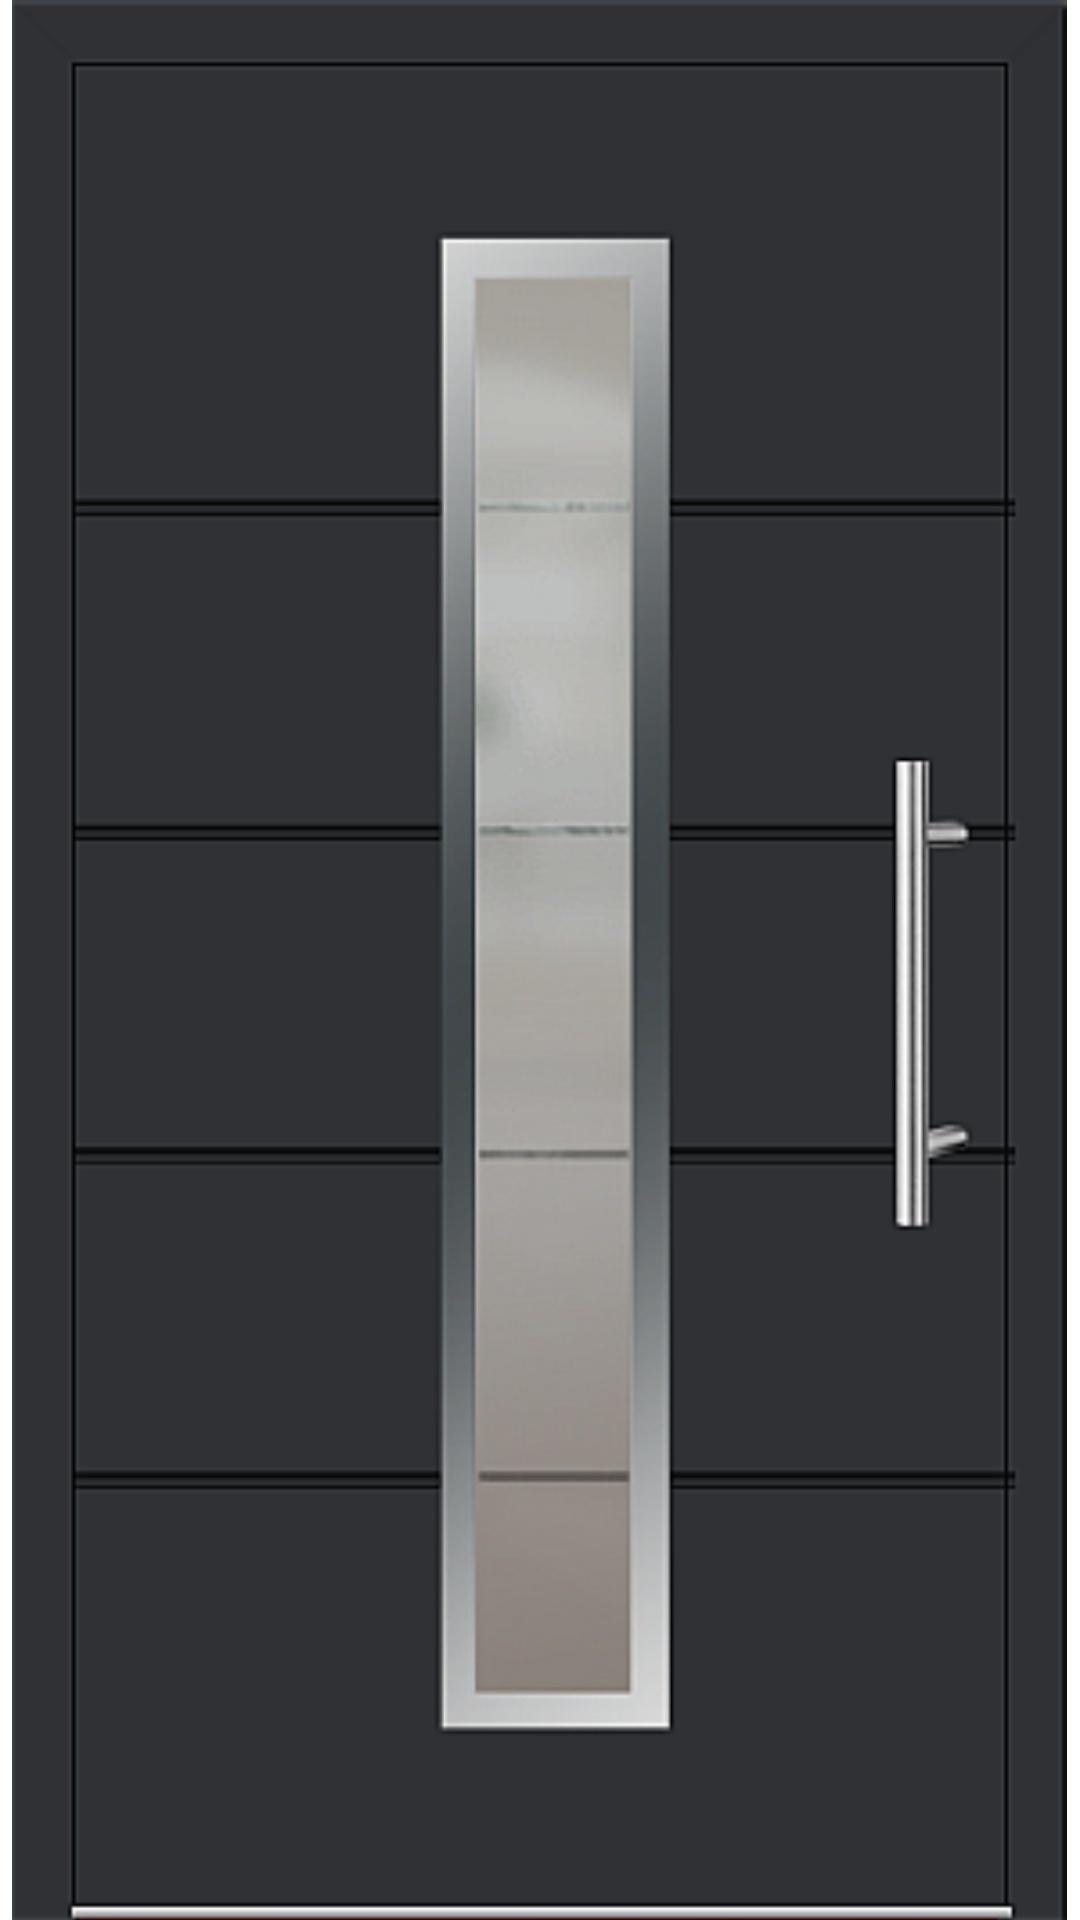 Aluminium Haustür Modell 6560-72 schwarz